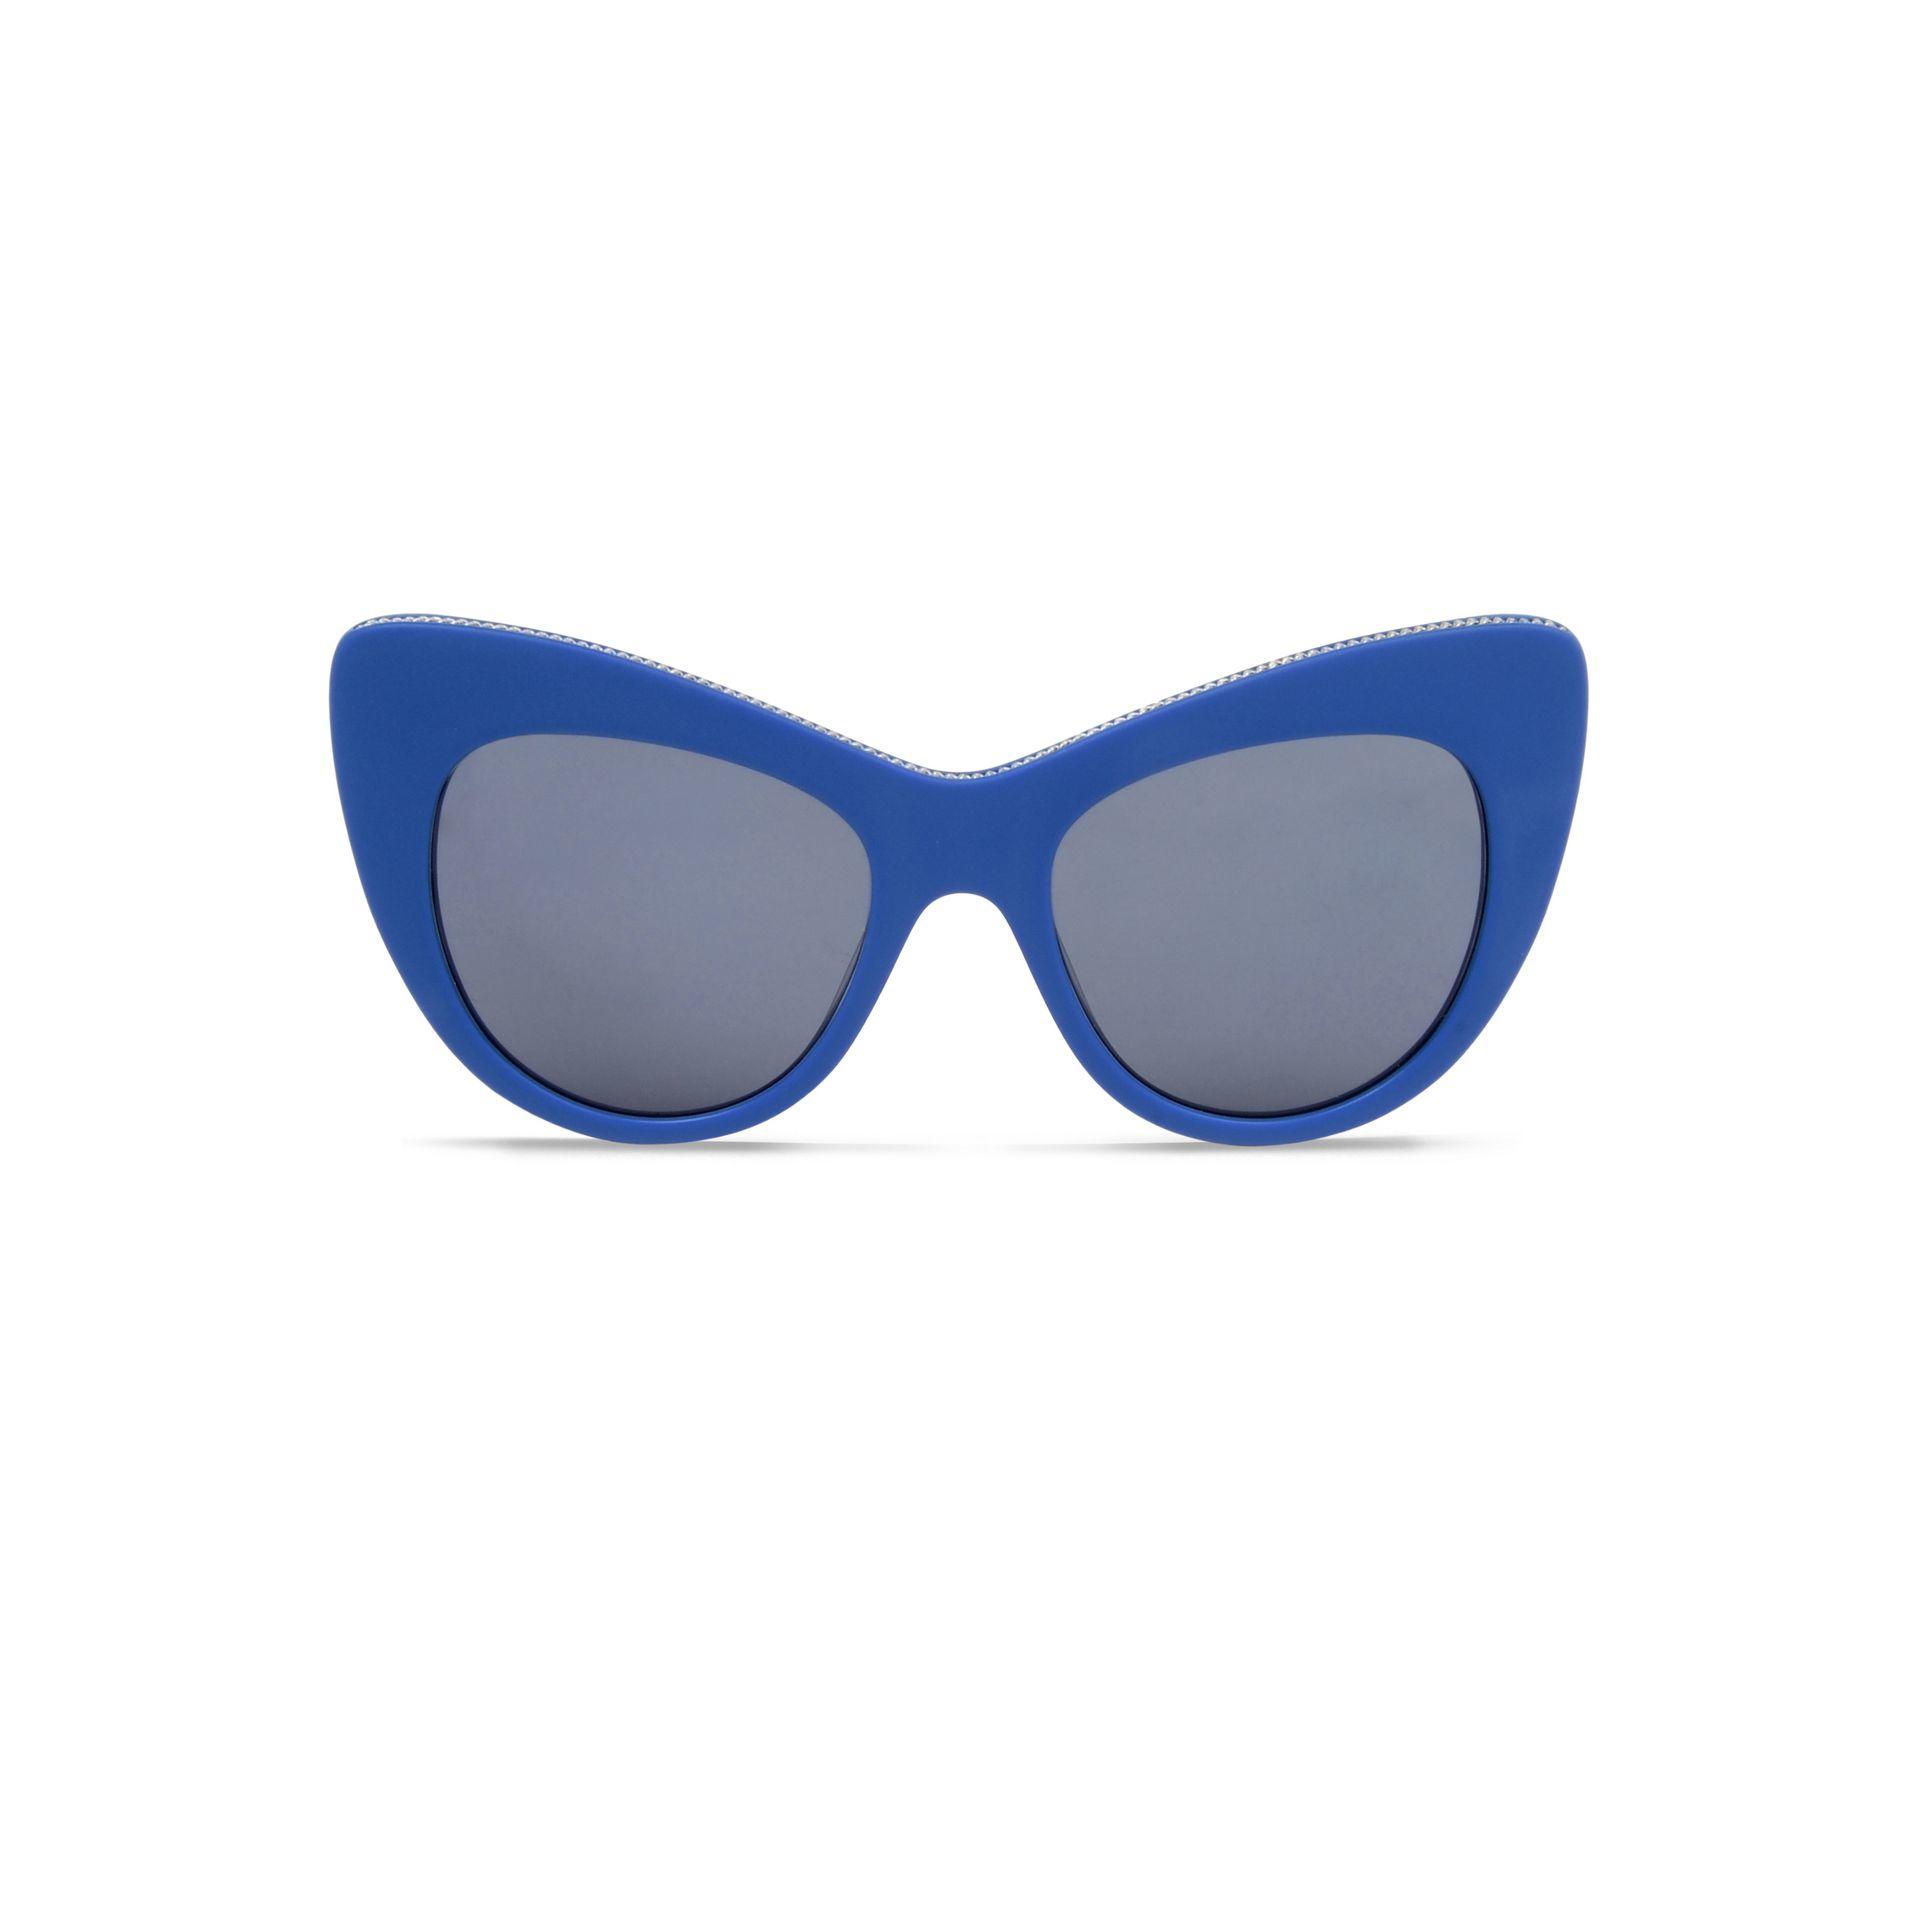 Stella Mccartney Cobalt Oversized Cat Eye Sunglasses In